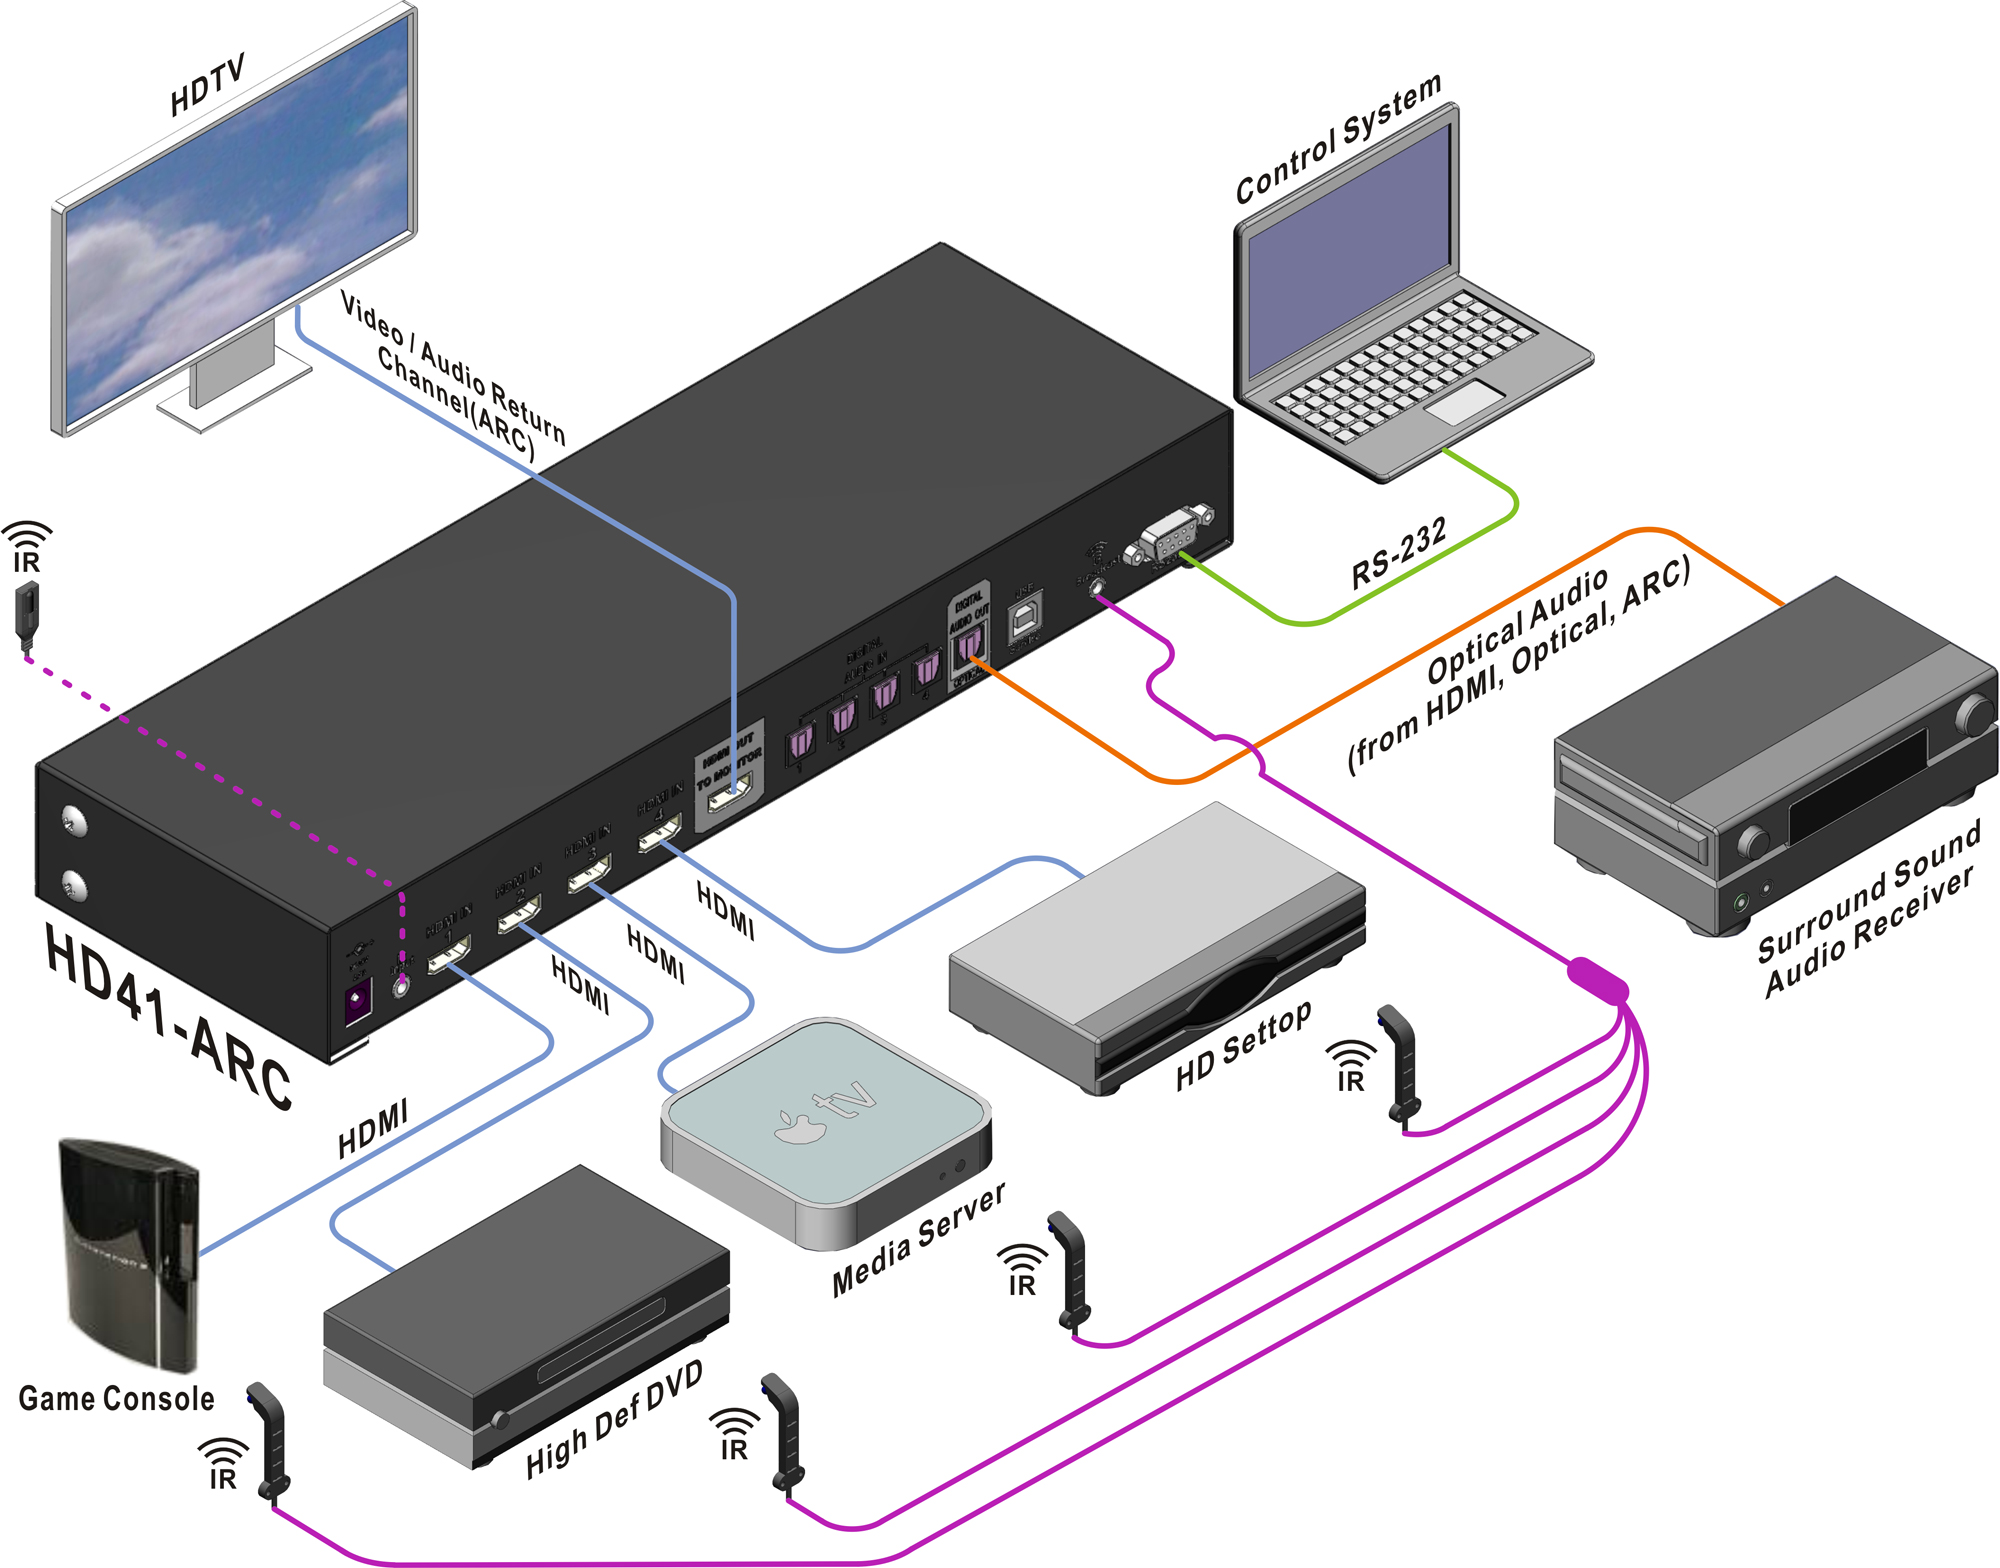 Wiring Diagram For A Sound Bar Engine Control Sony Octava Uhd41 Arc The Media Factory